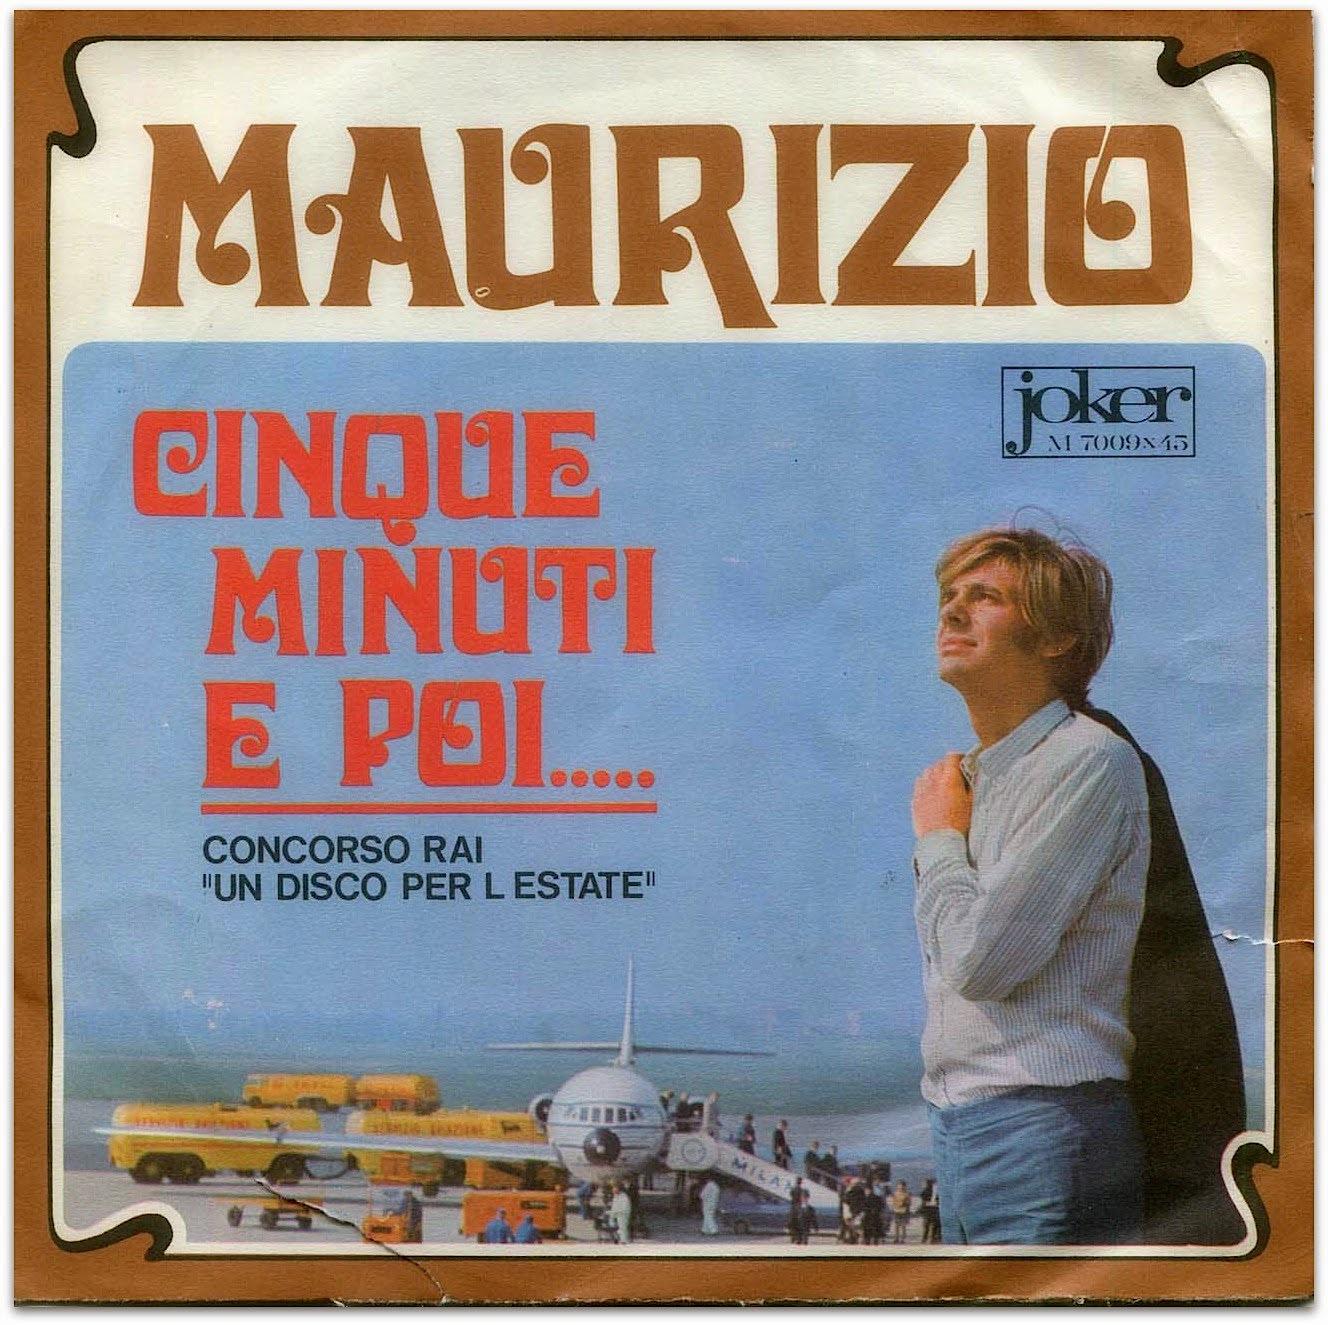 MAURIZIO-5-MINUTI-E-POI-NEW-DADA_copertina